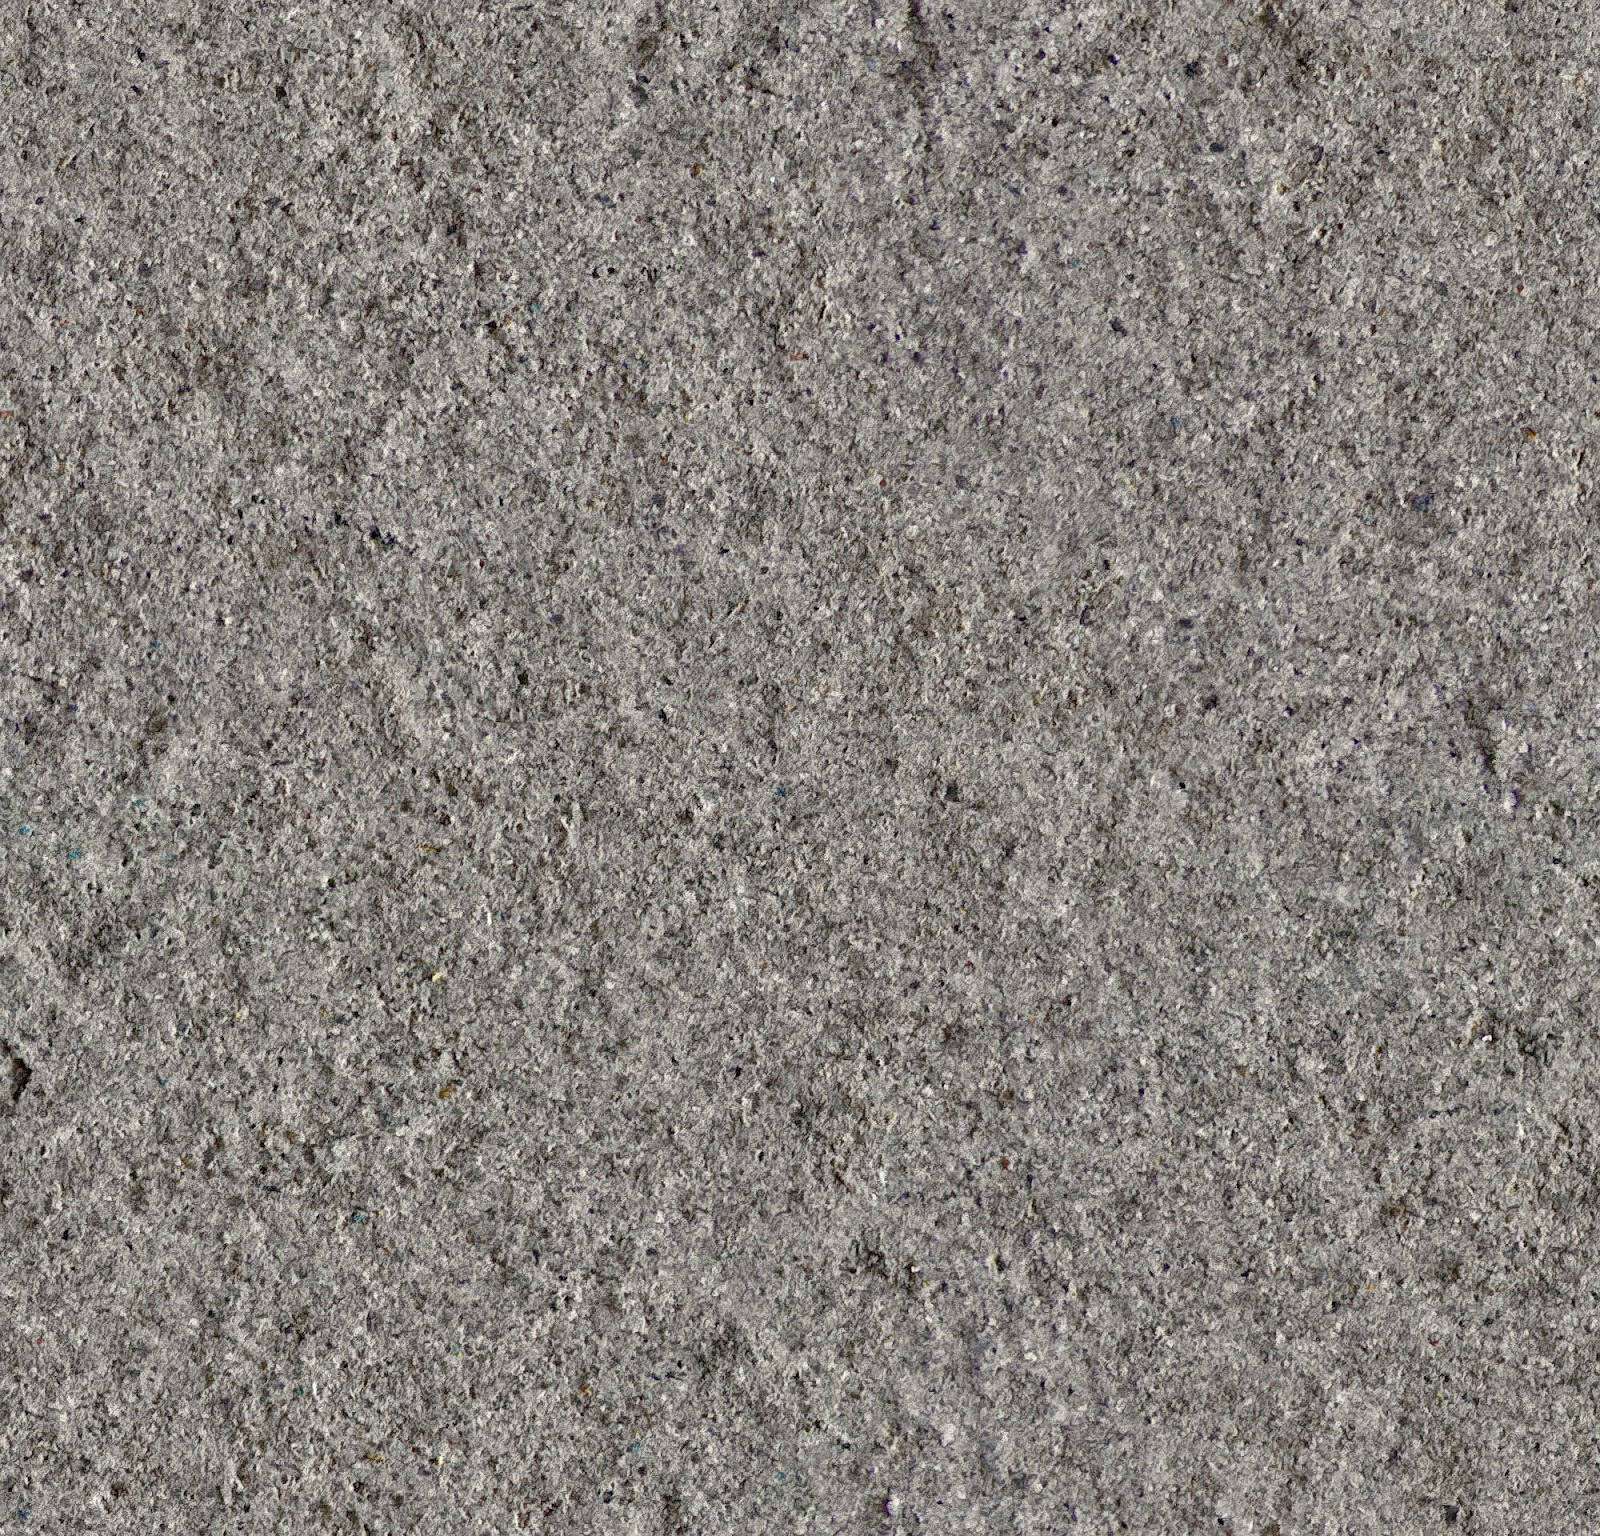 High Resolution Seamless Textures Free Concrete